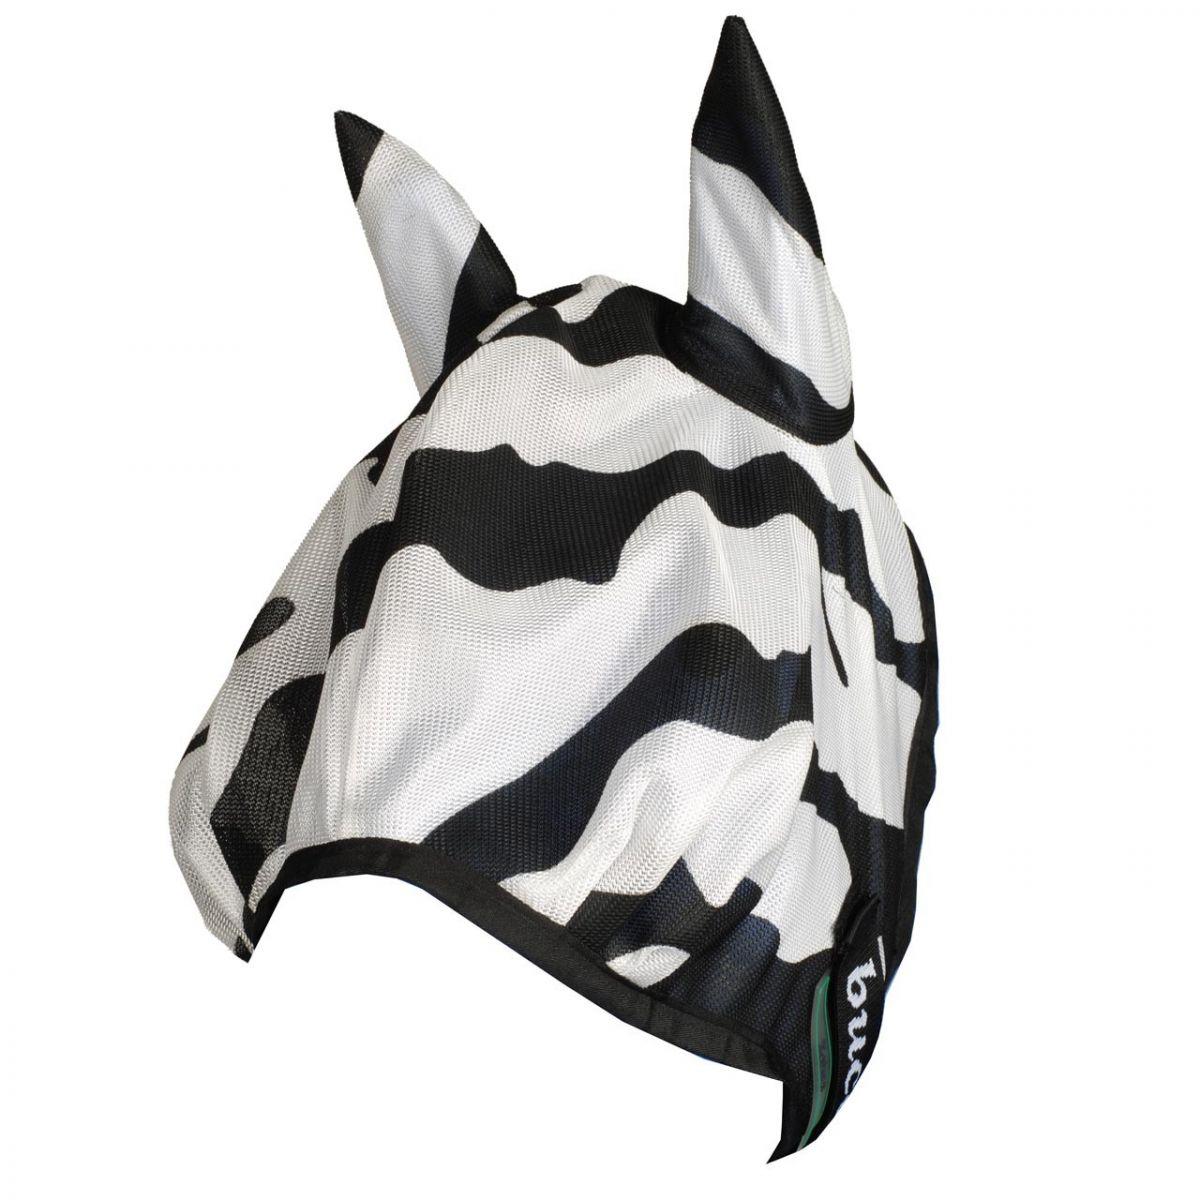 Bucas Buzzoff Zebra vliegenmasker zwart/wit maat:m